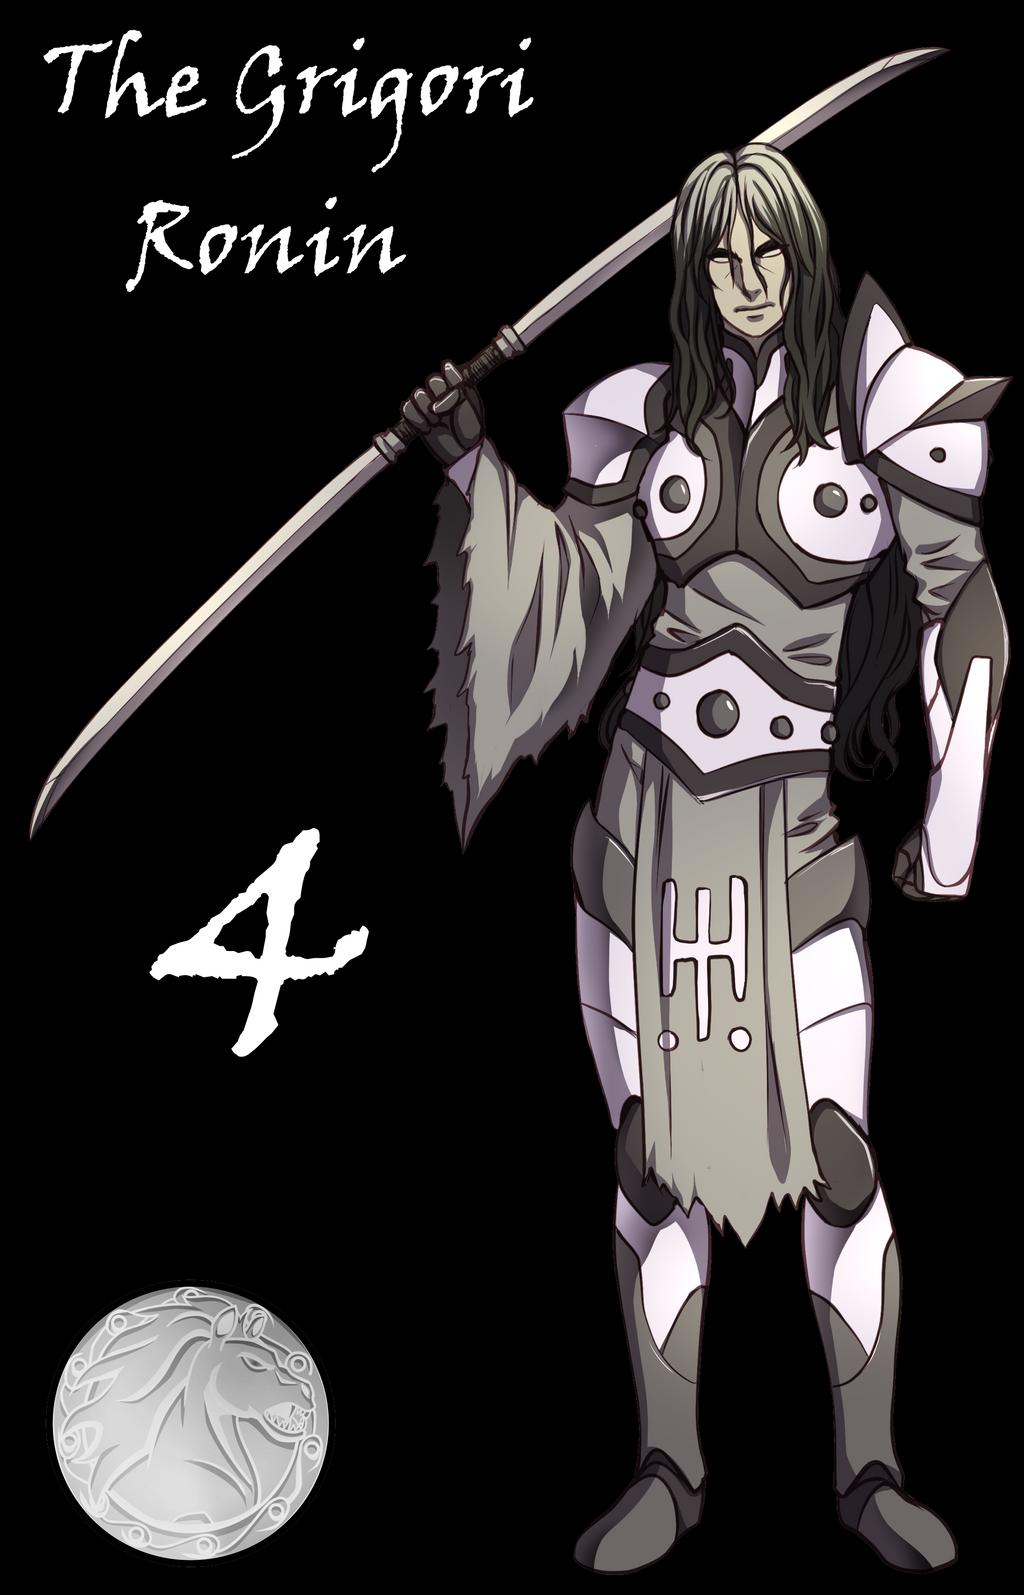 ronin__the_grigori_4_horsemen_by_thegrigorianime-d9o78zy.png